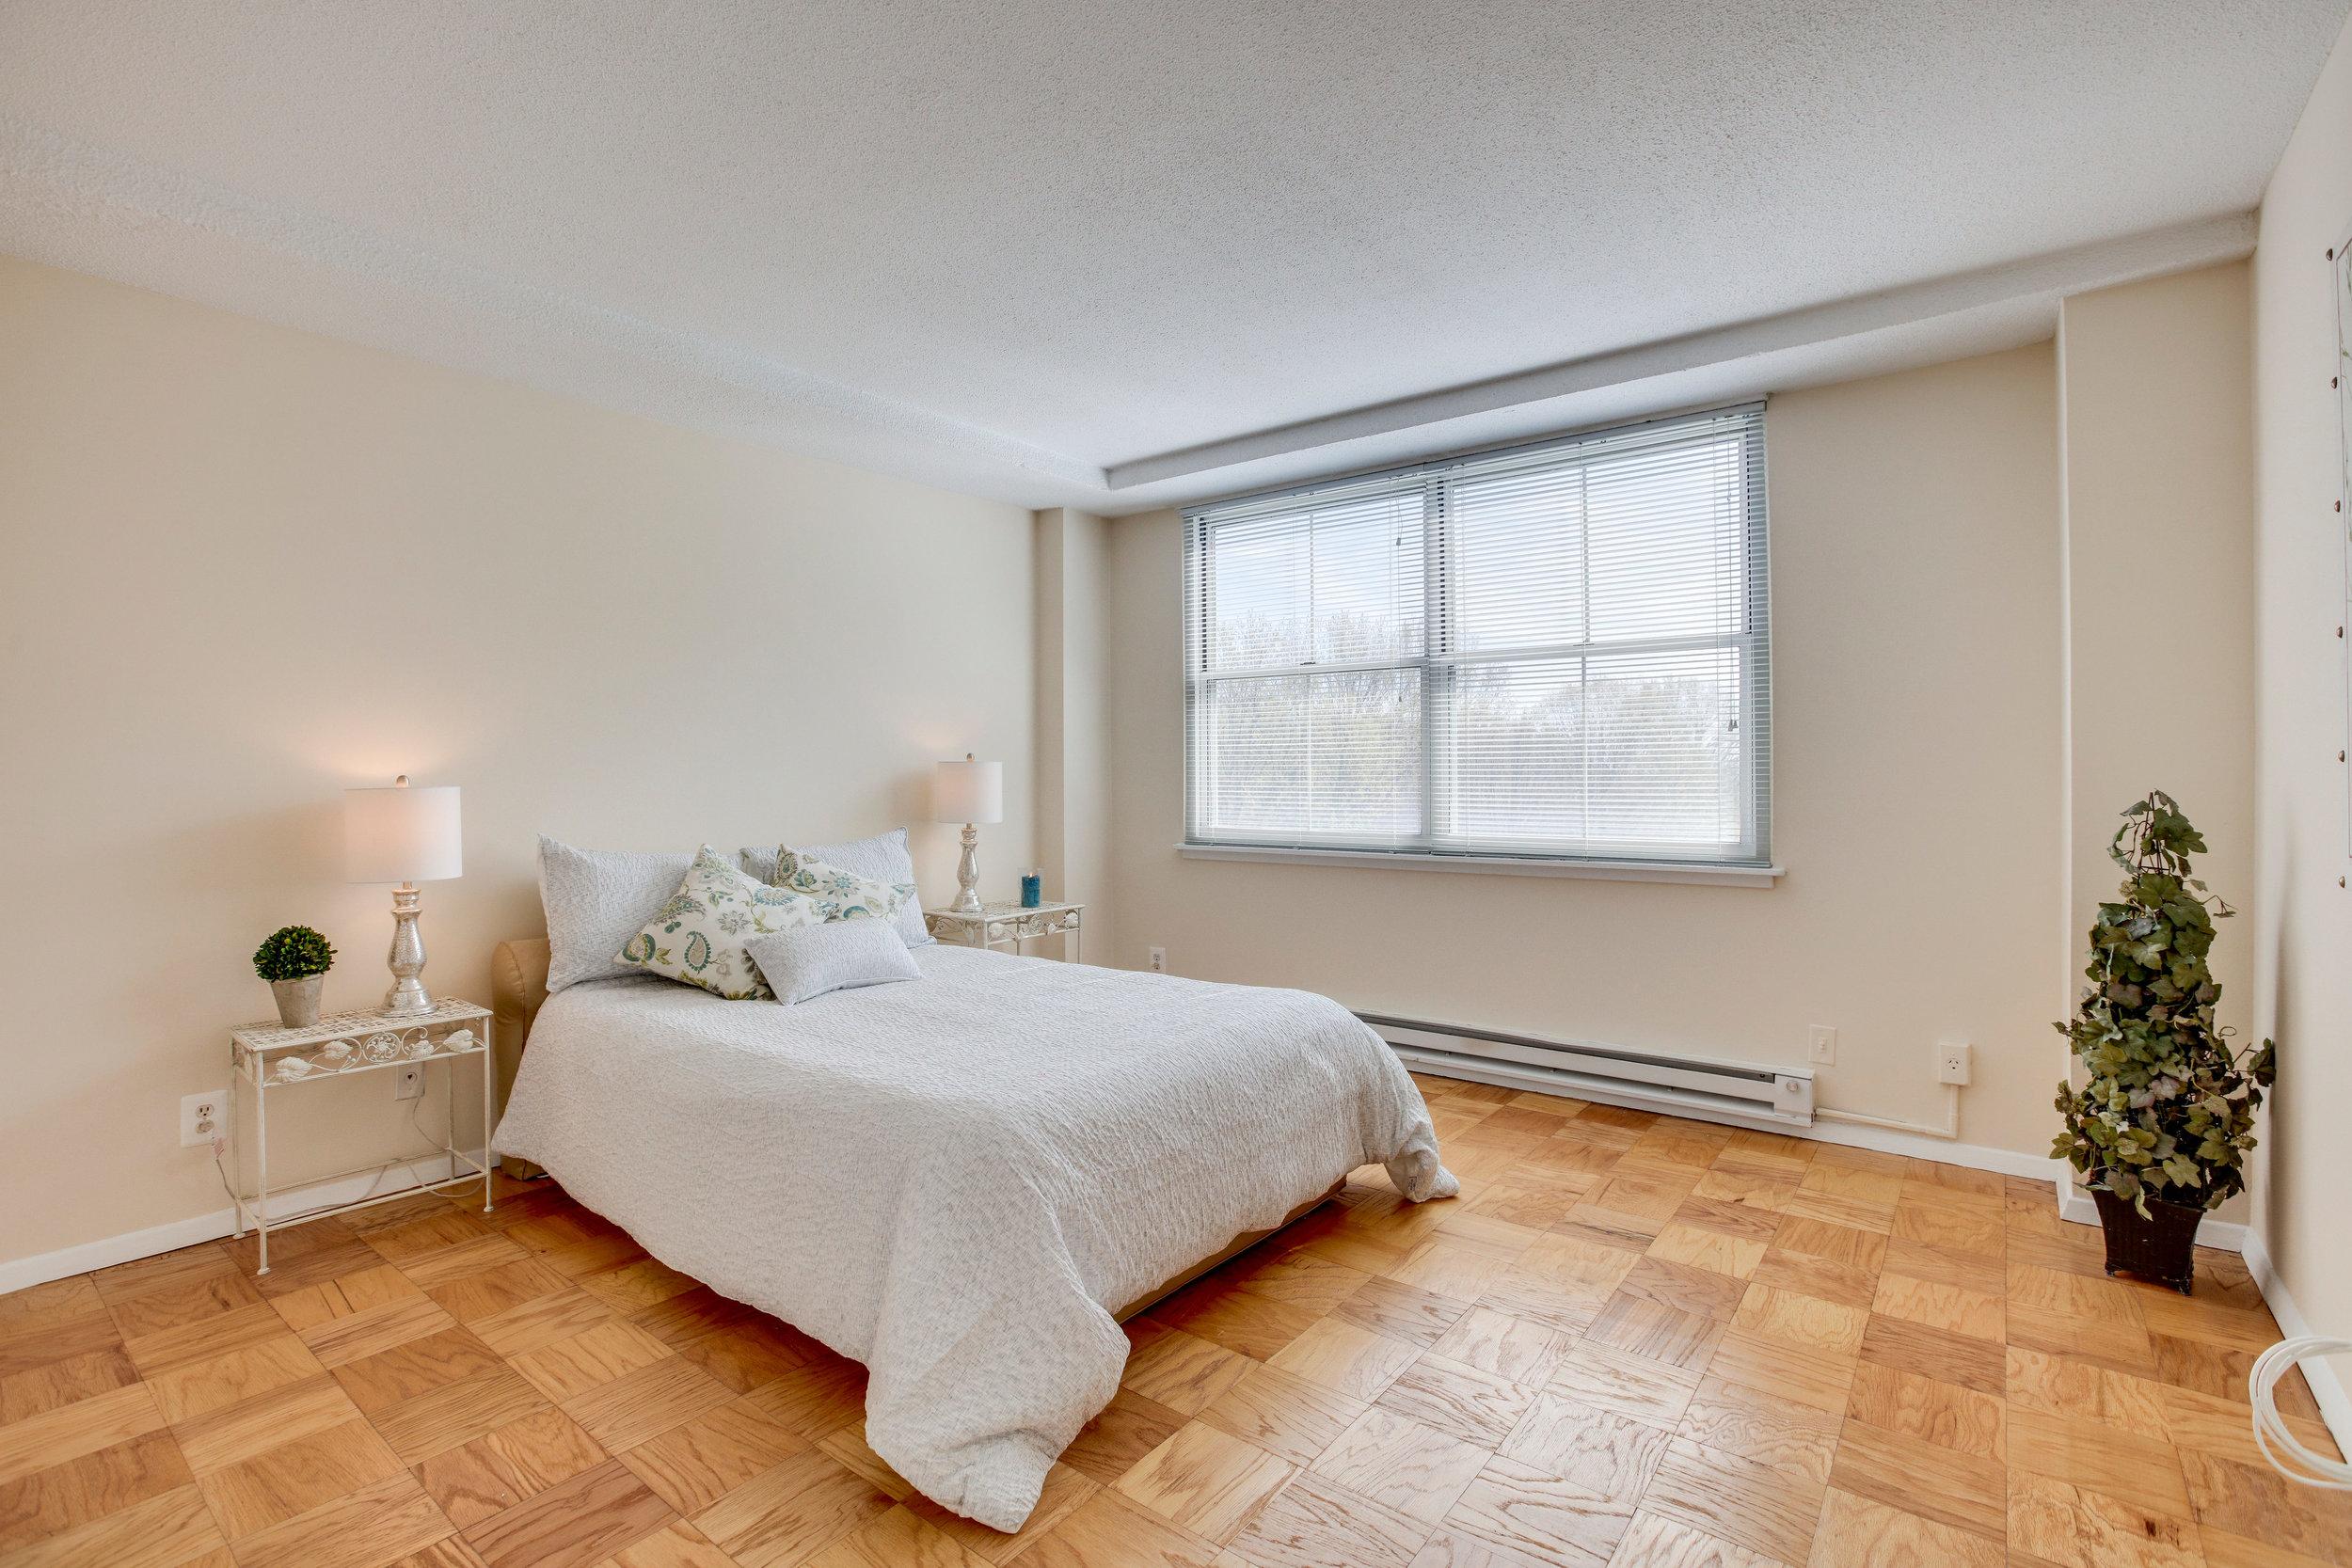 2030 N Adams St 1002 Arlington-print-026-96-Bedroom-4200x2800-300dpi.jpg